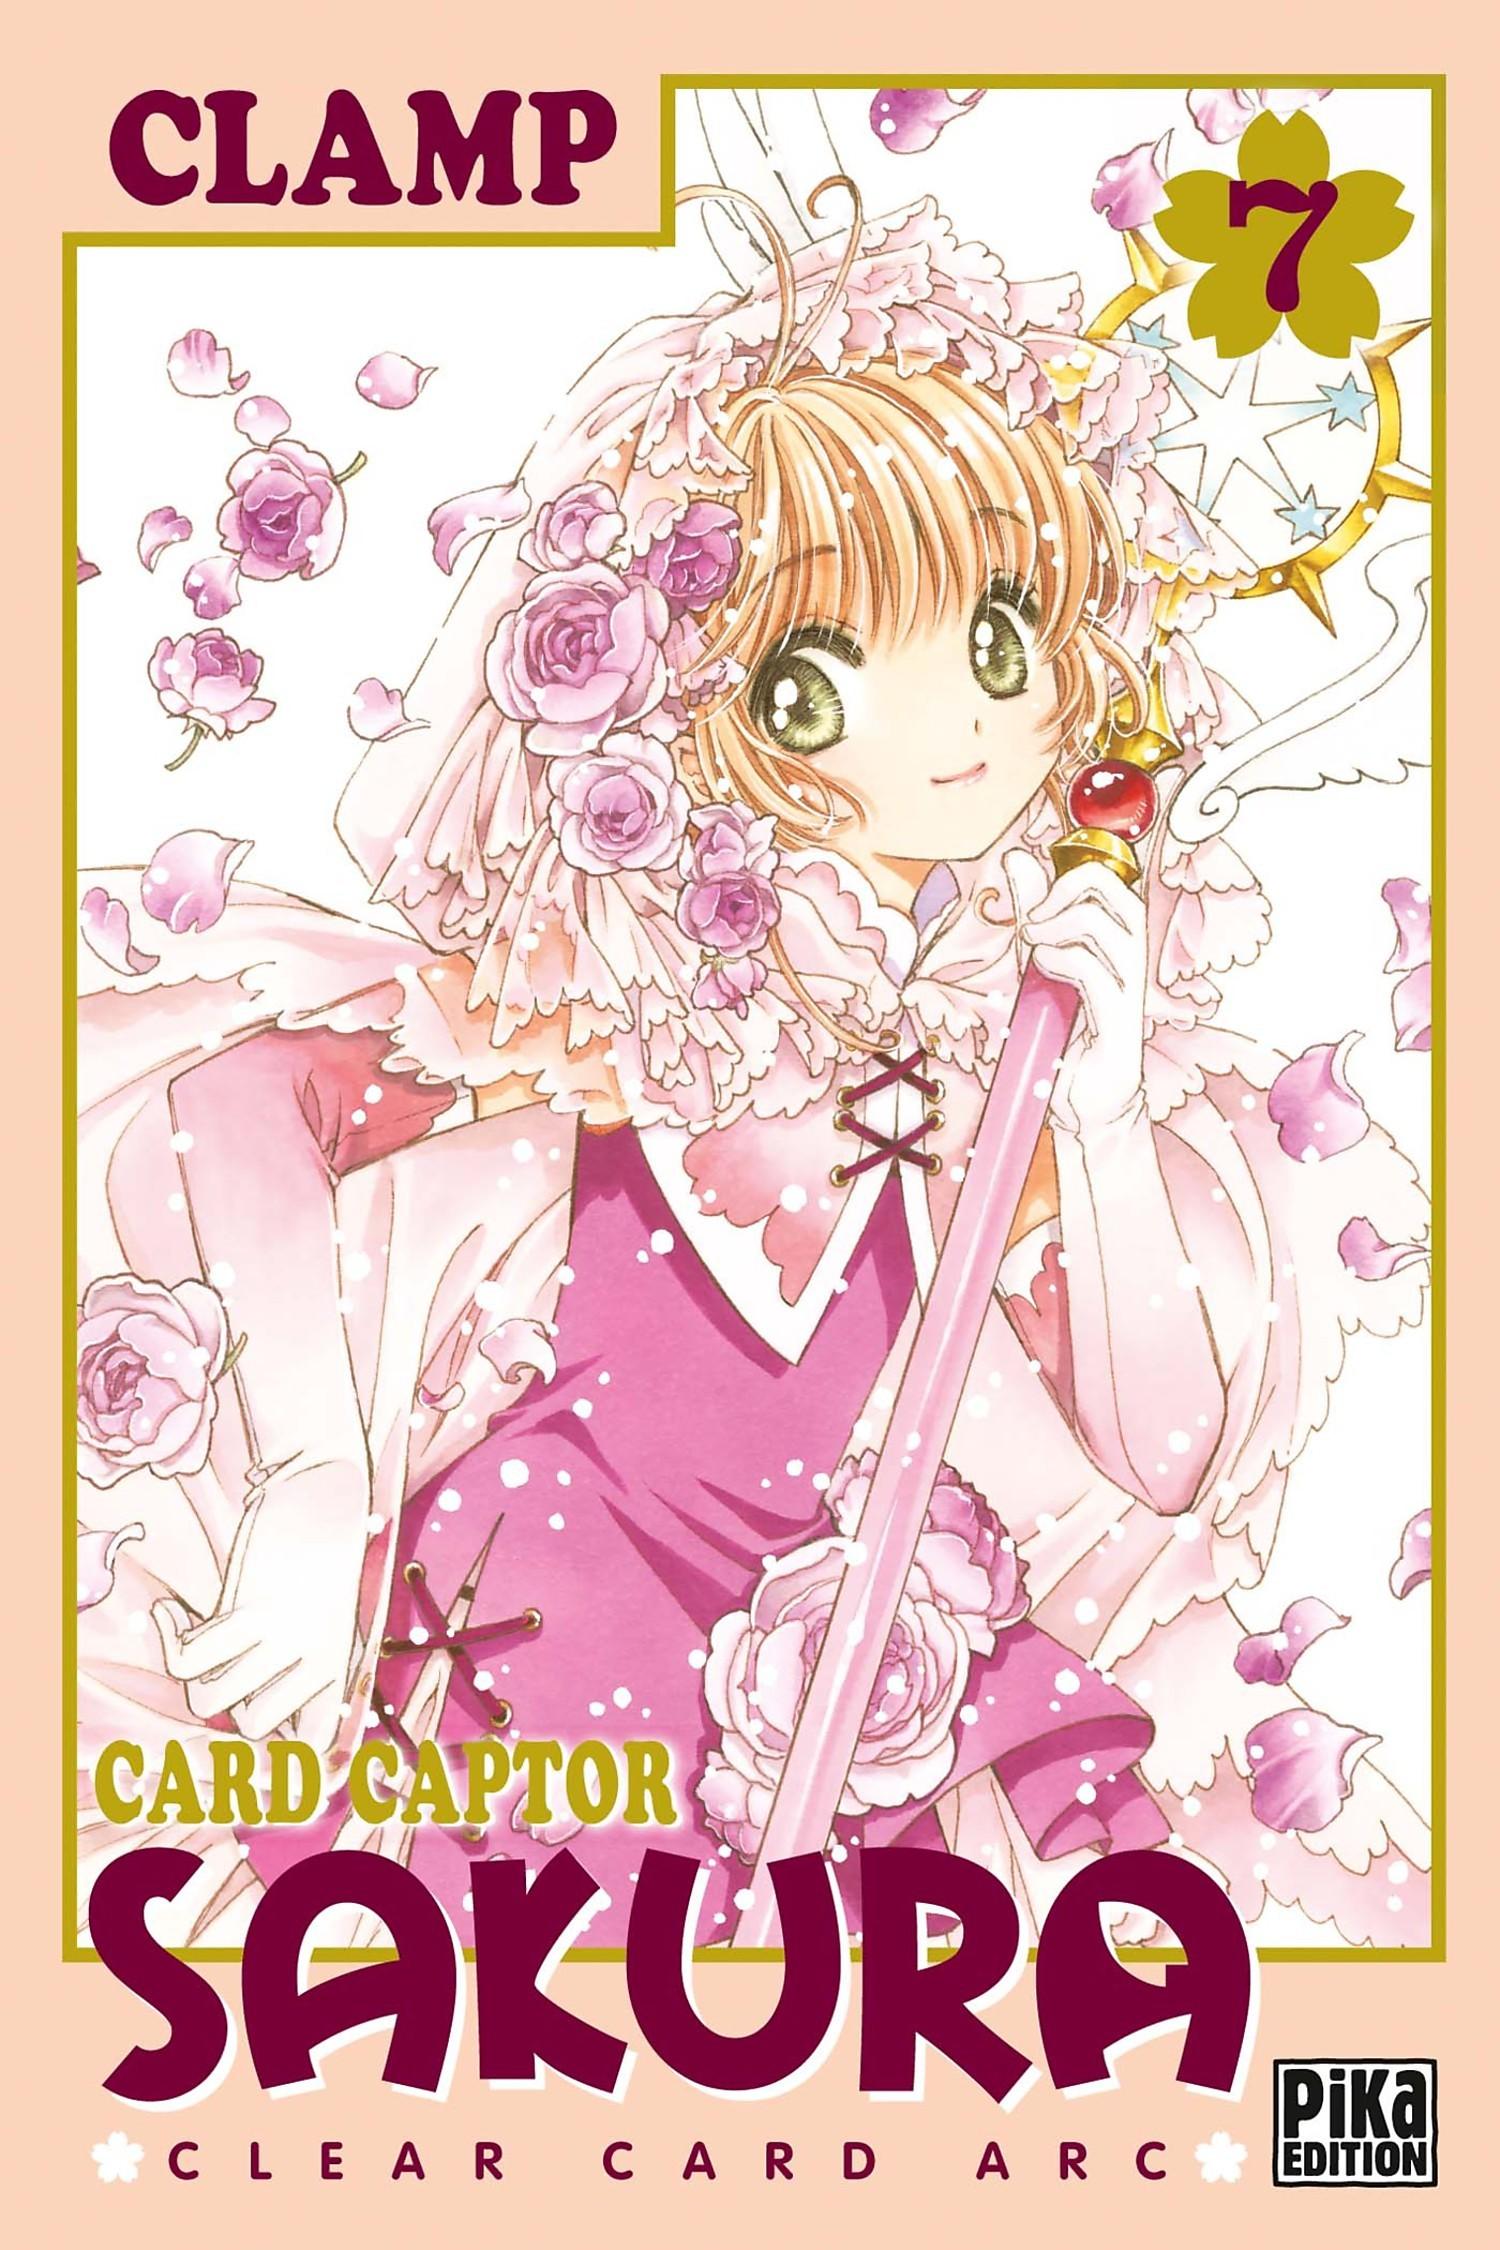 Card captor Sakura - Clear Card Arc 7